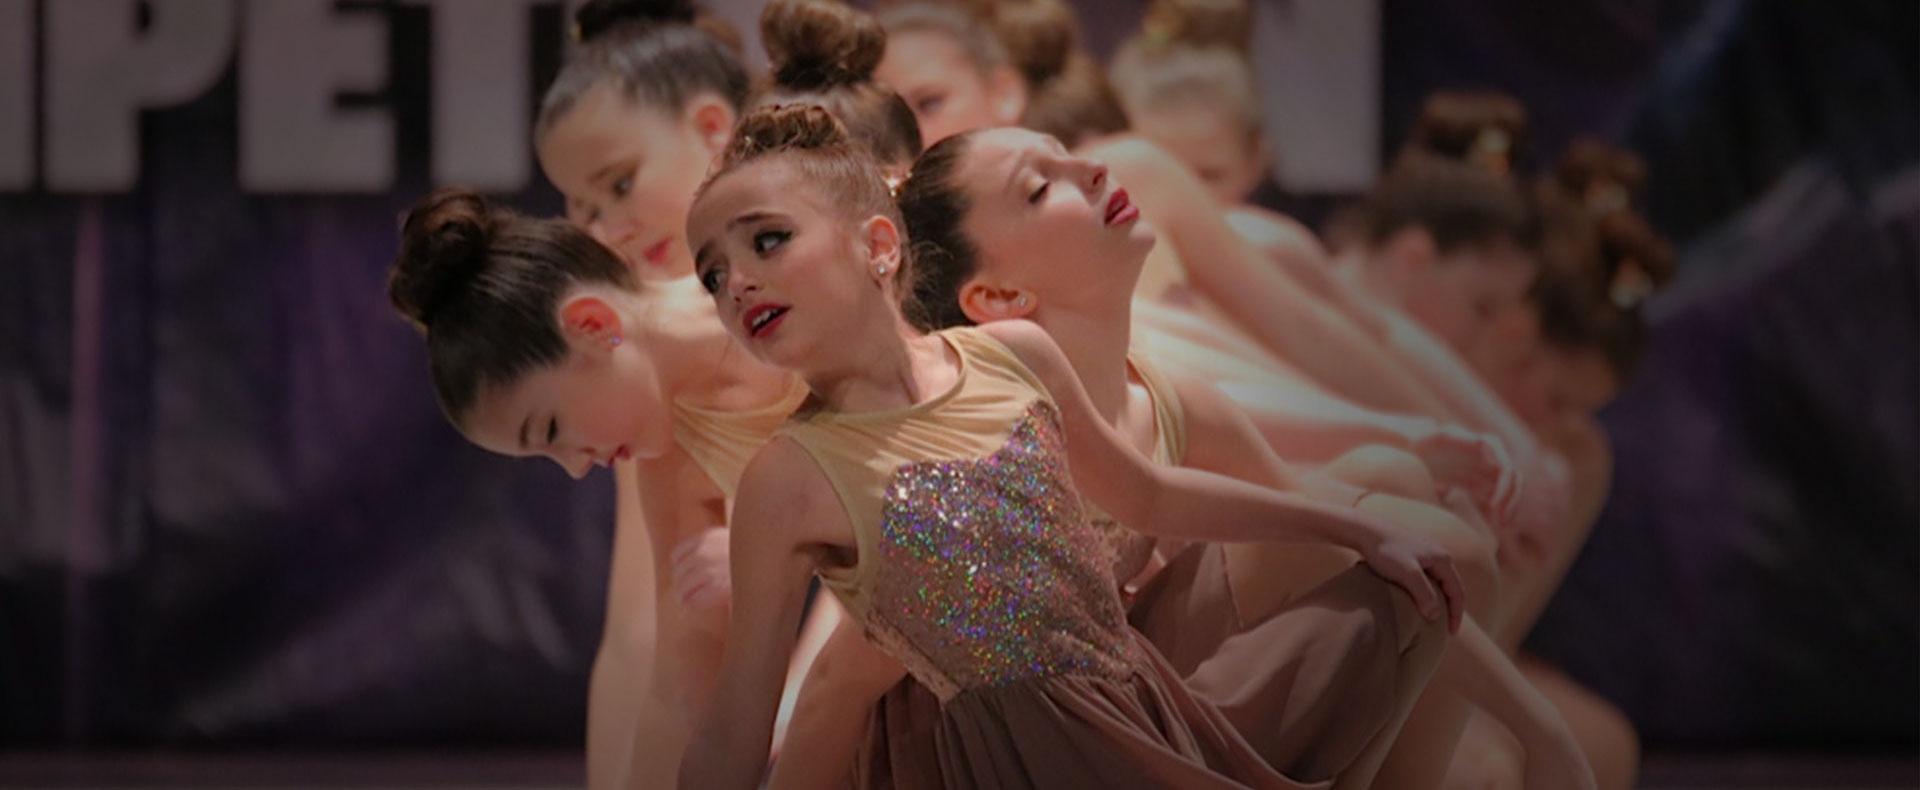 Maple Avenue Dance Center (@mapleavenuedance) Cover Image